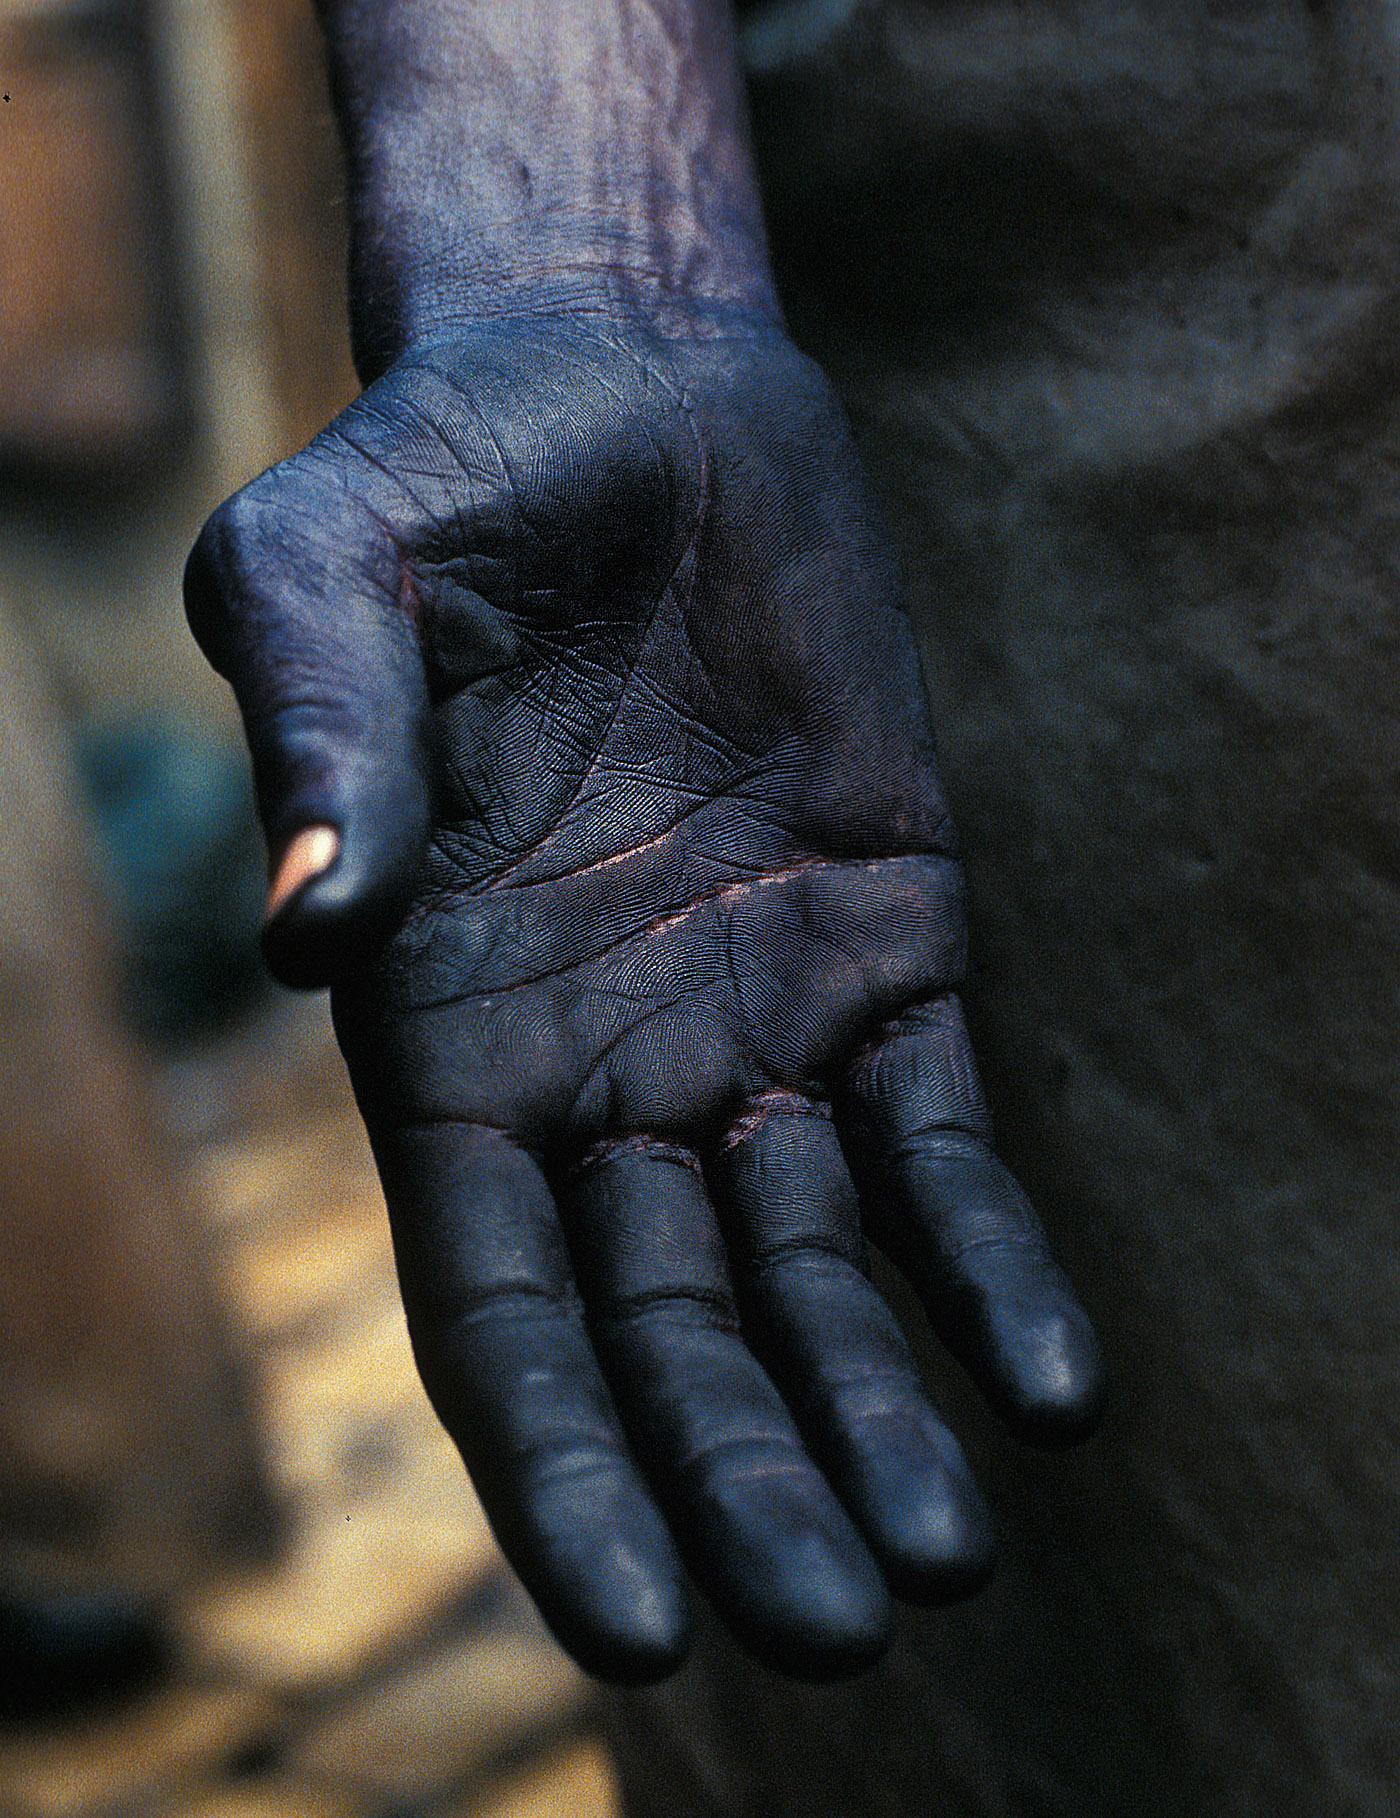 Dyer's hand